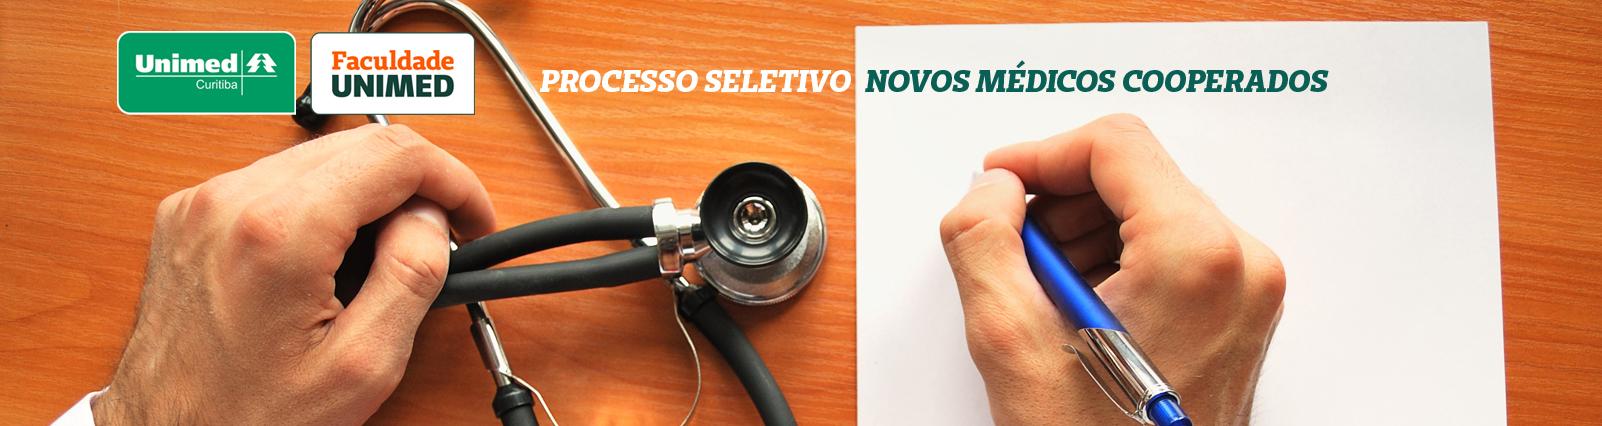 Processo Seletivo Unimed Curitiba